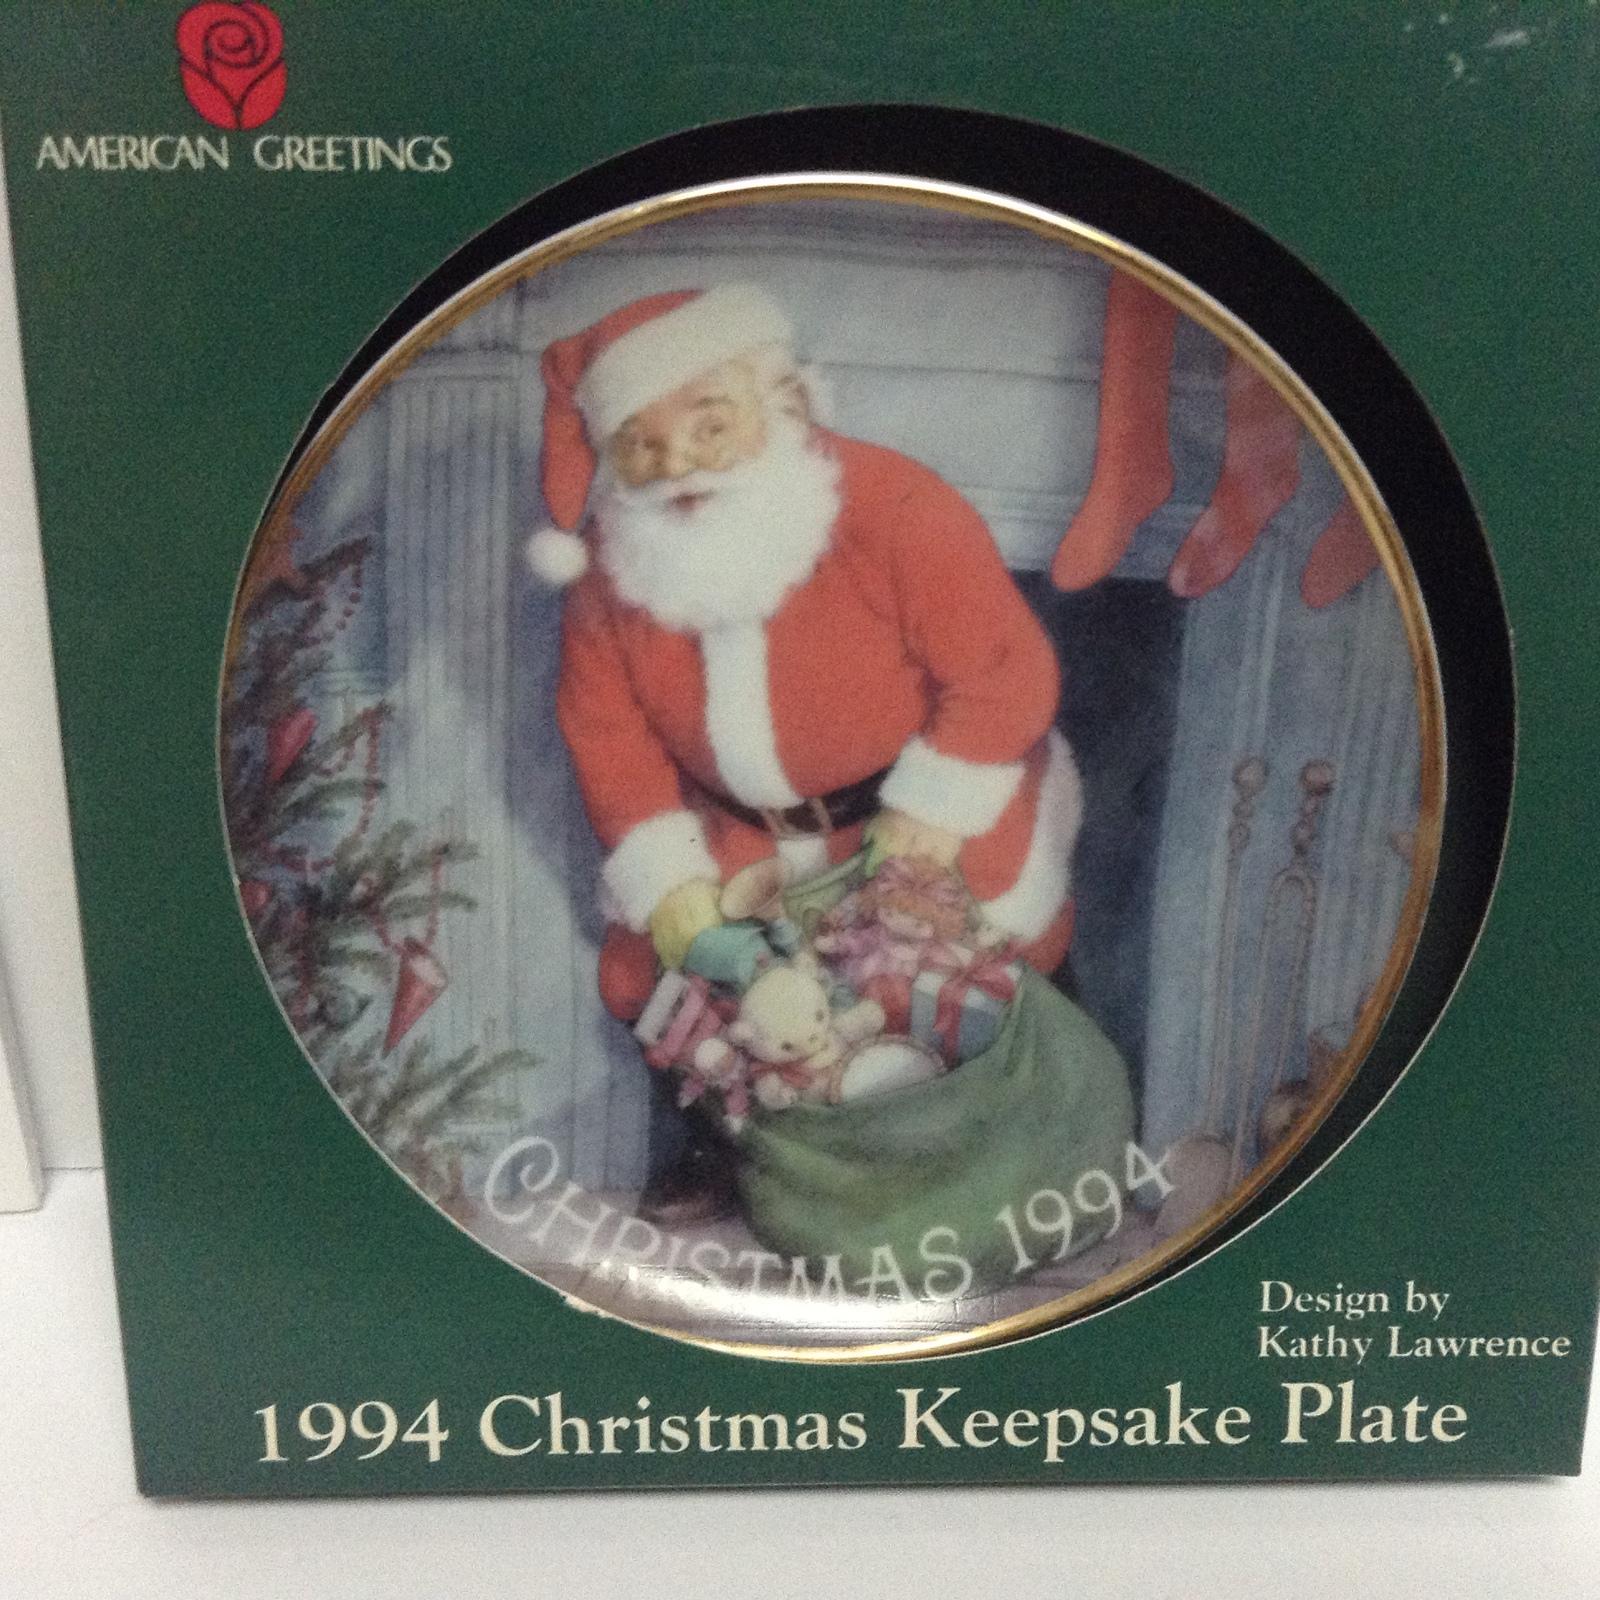 American Greetings Christmas Plate 1994 New in Box Santa